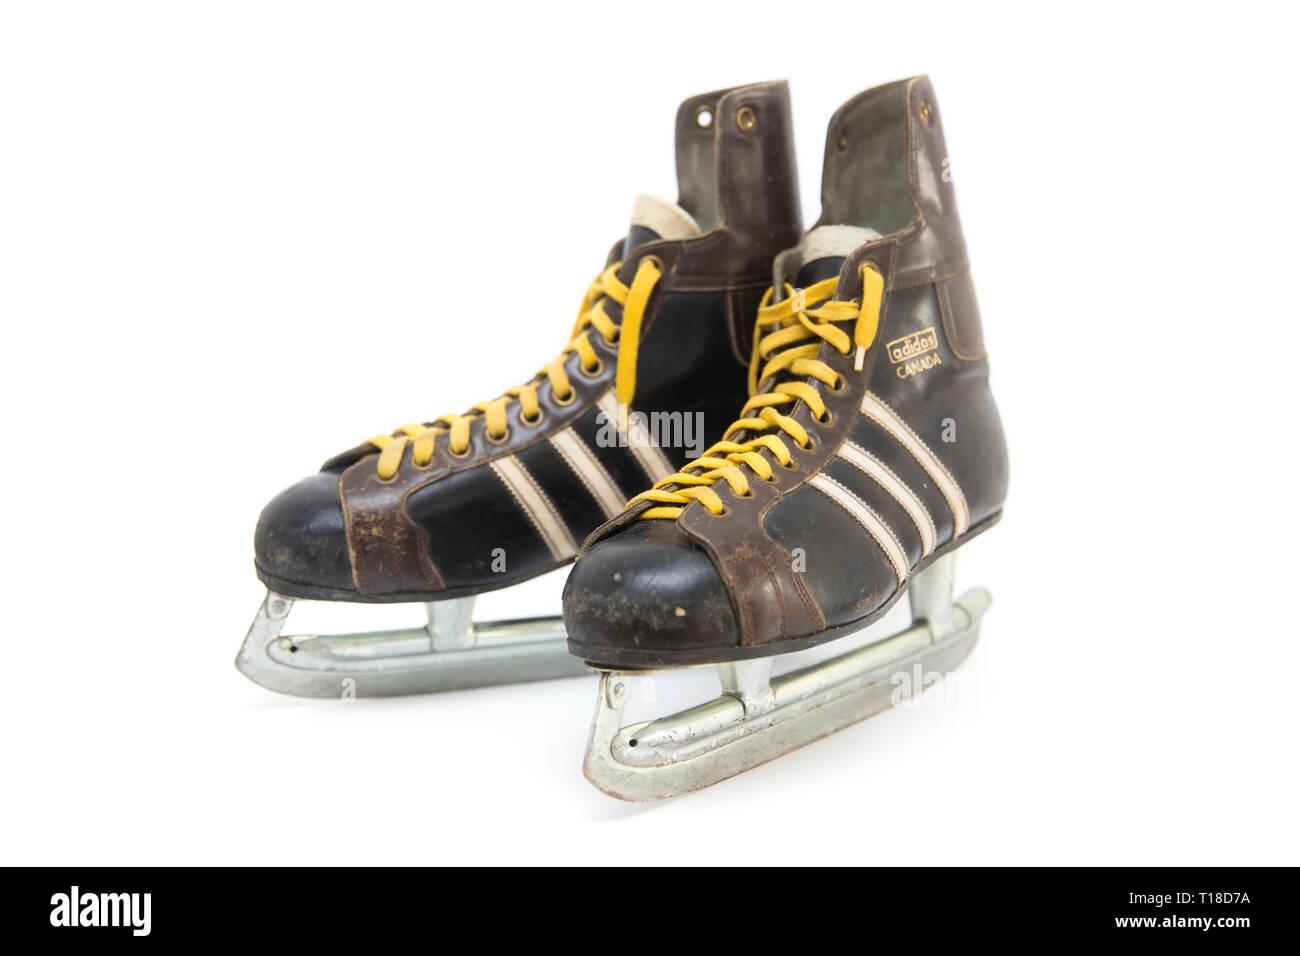 In 162019Vintage Adidas BelgradSerbien Skate Januar Schuhe T1JclFK